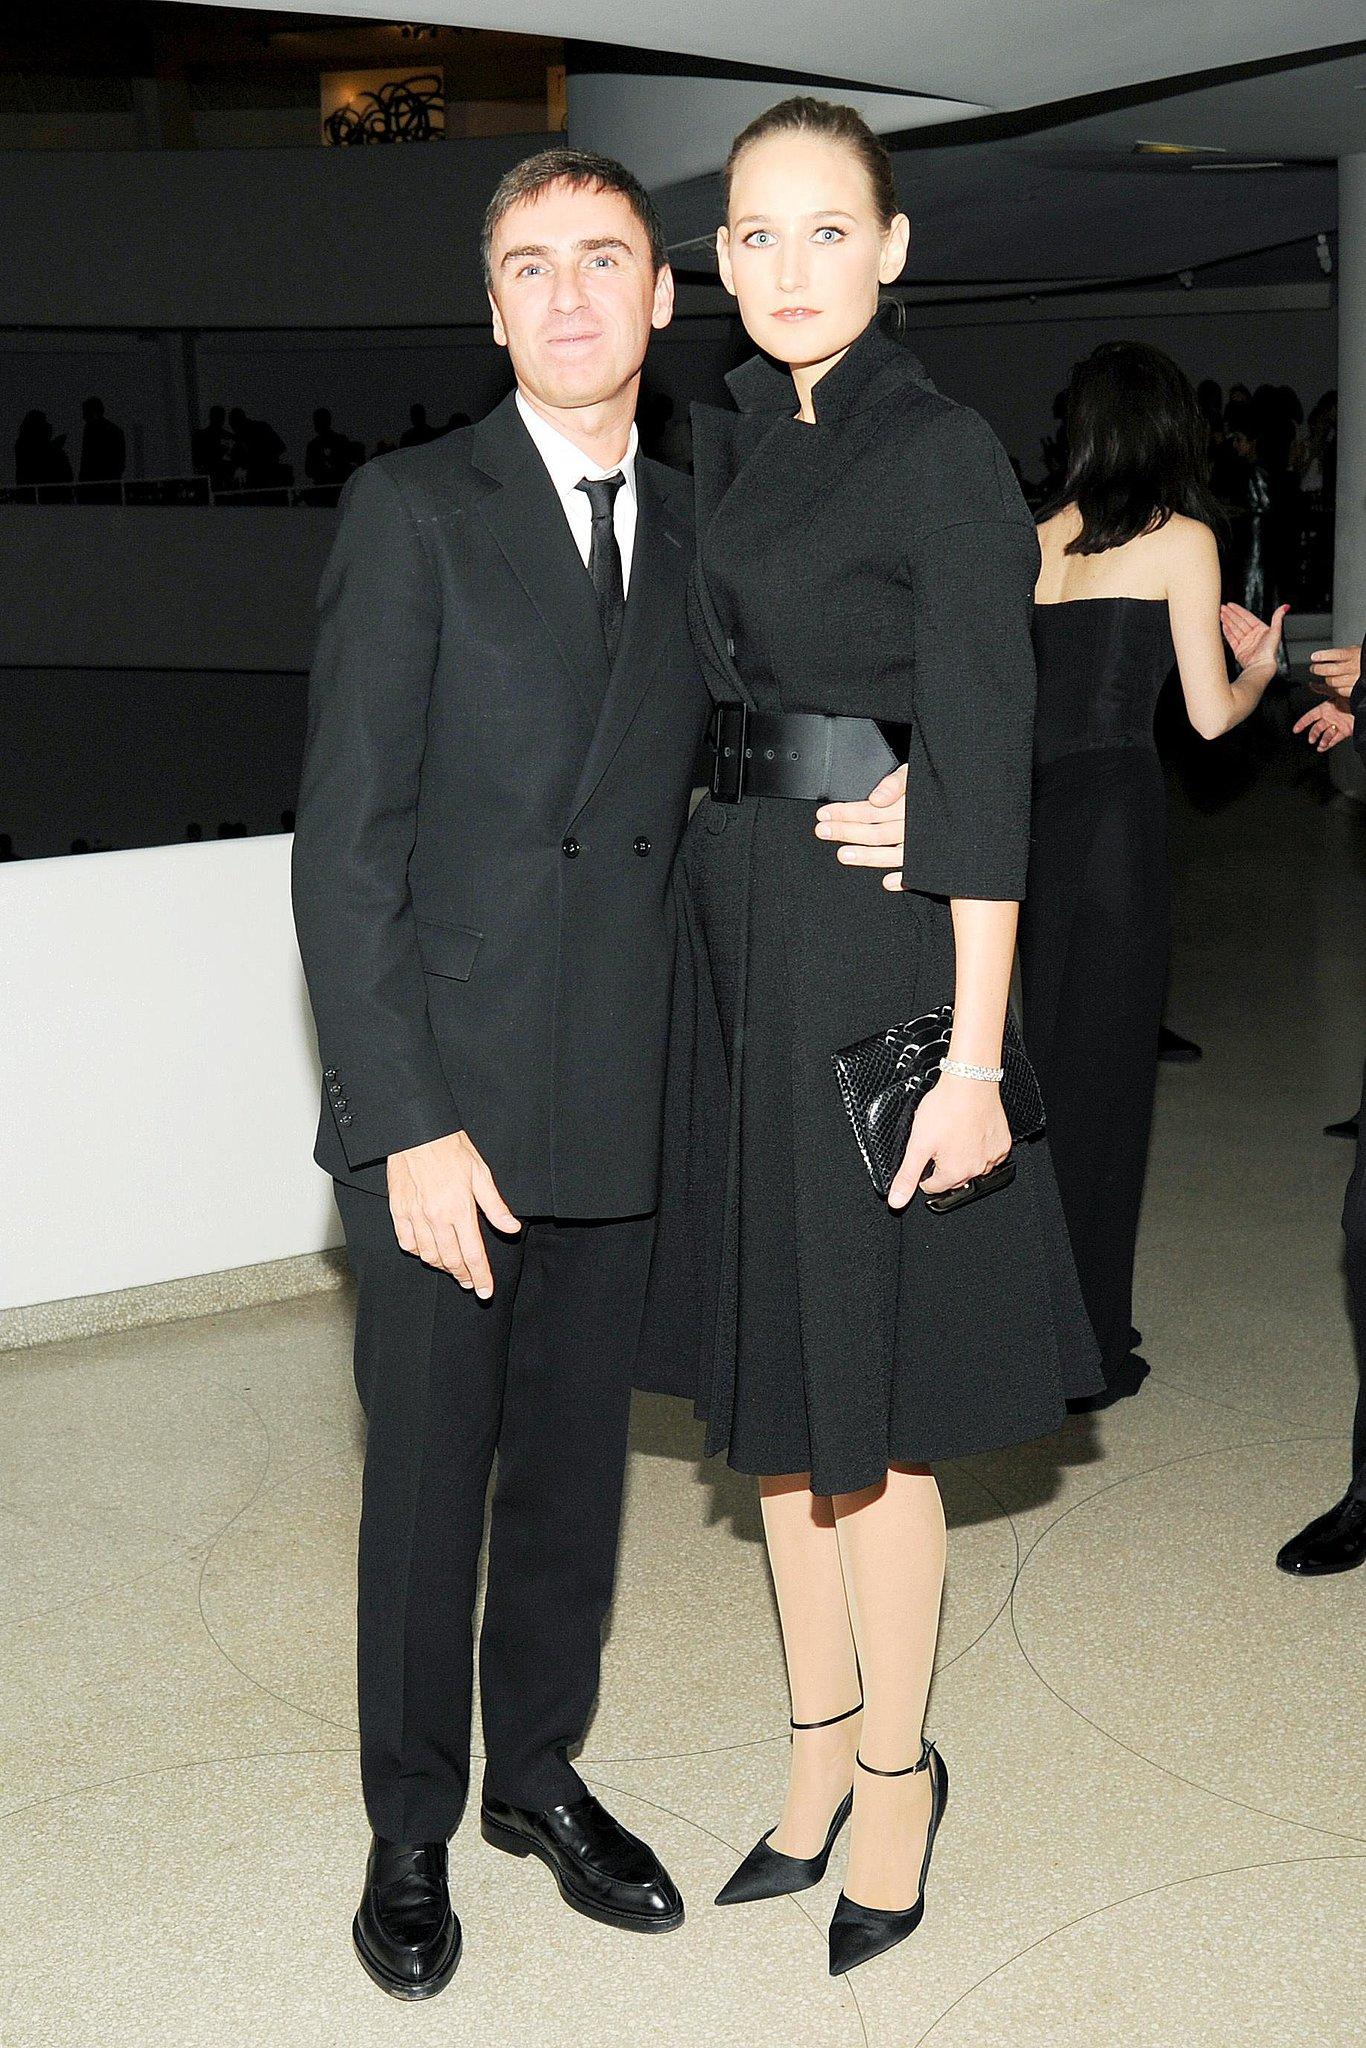 Leelee Sobieski joined Raf Simons at Dior at the Guggenheim International Gala.